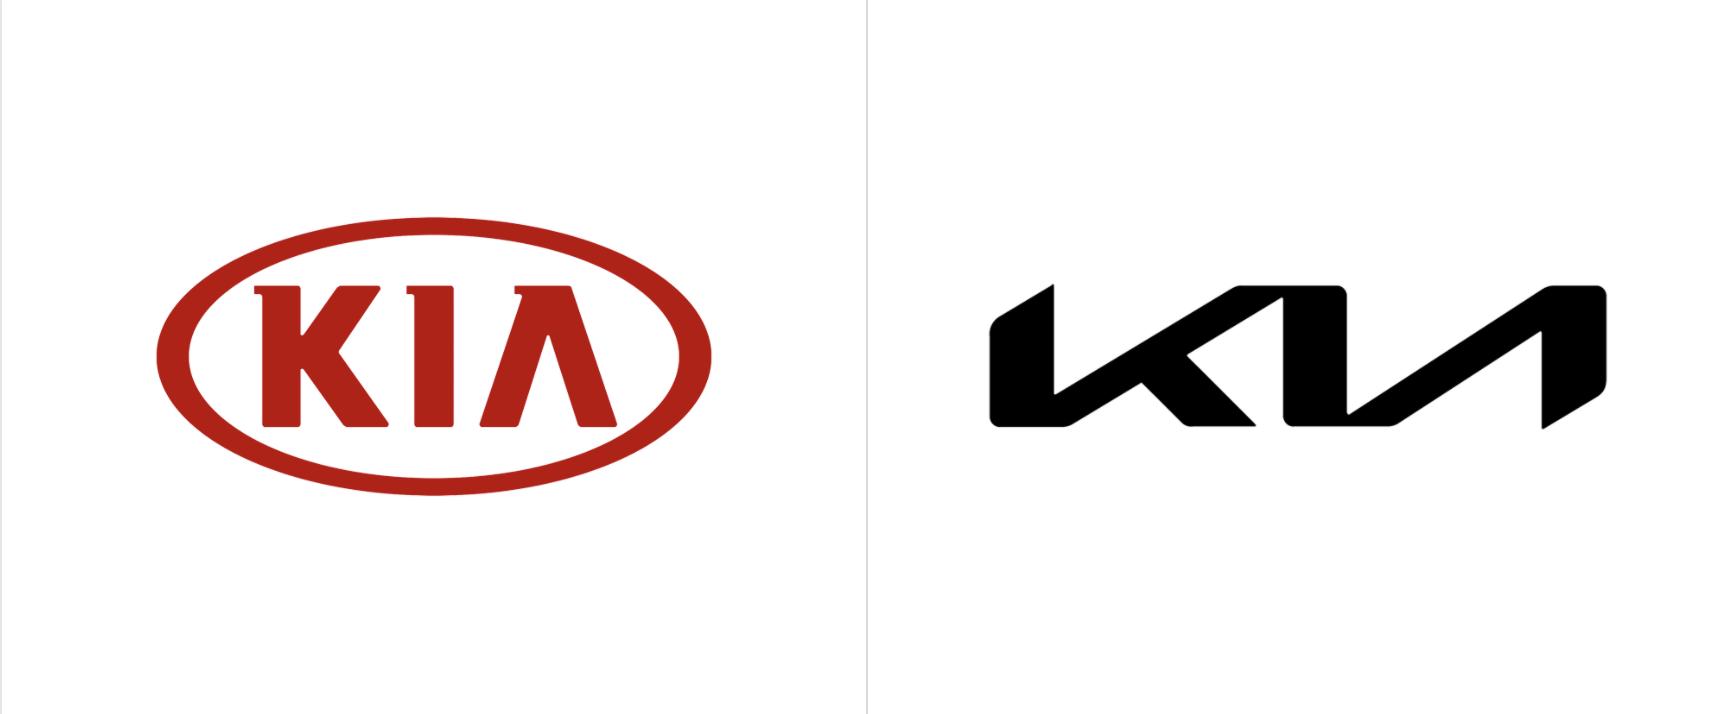 Auto brand trends: KIA logo